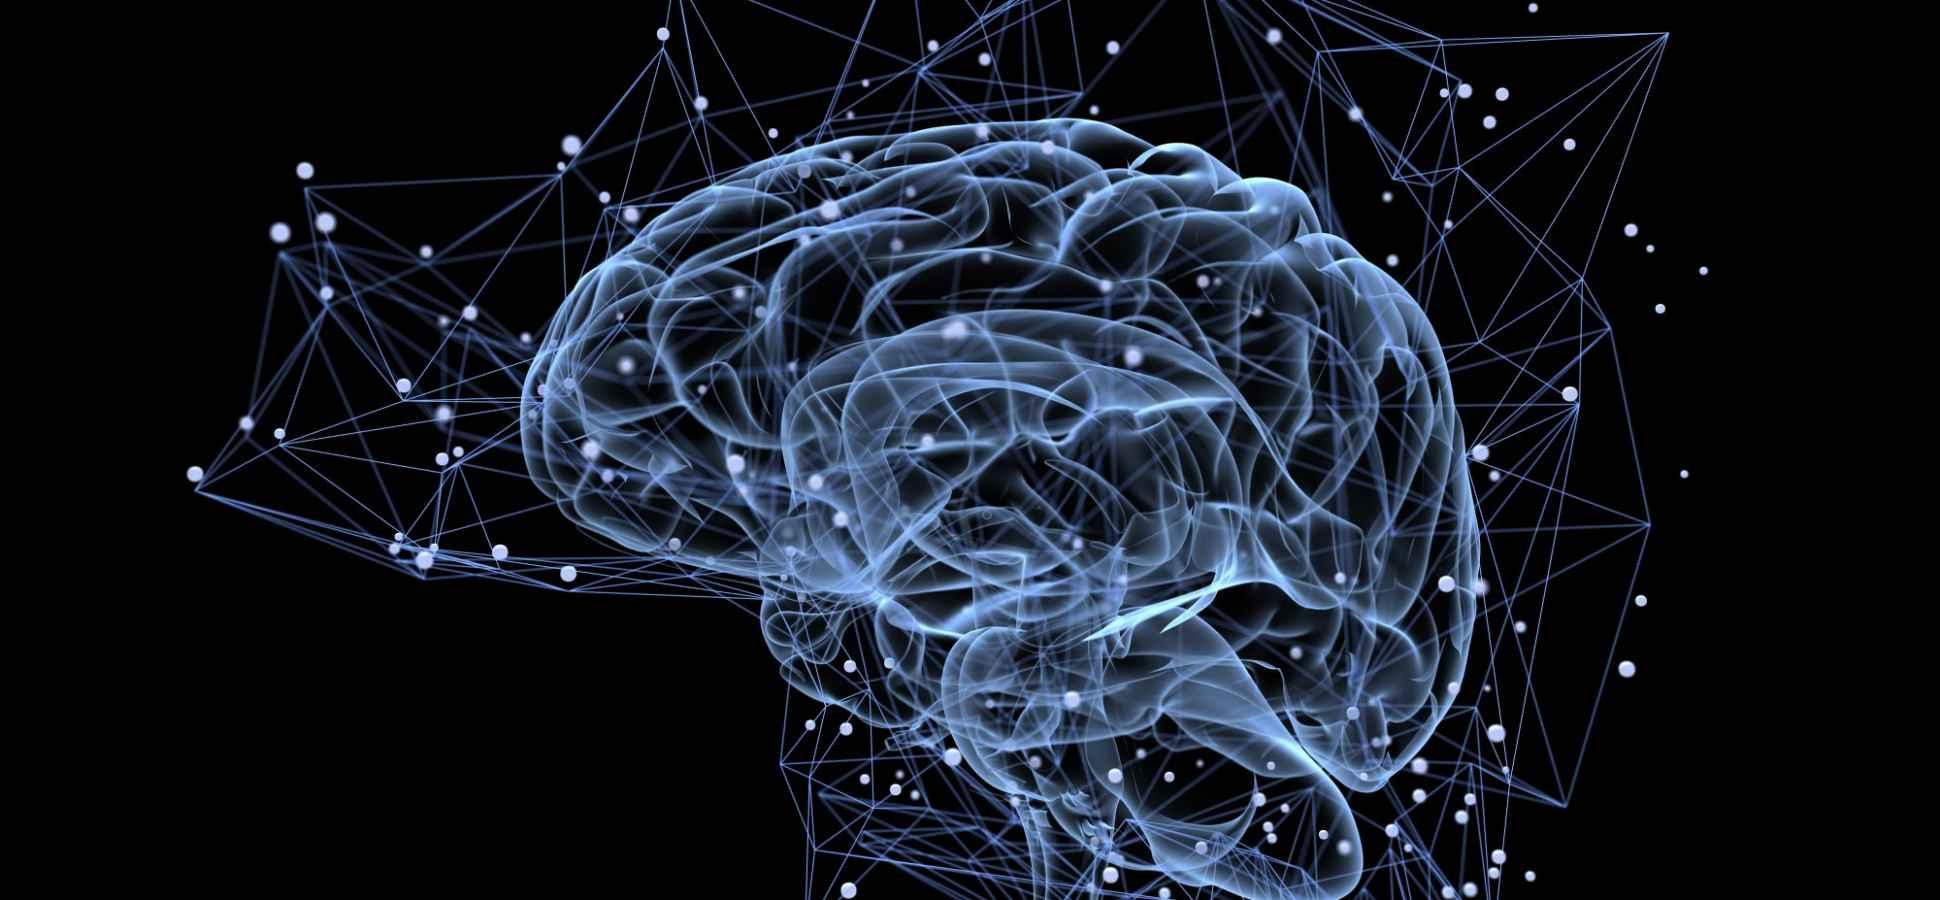 The Secret to Designing the Next Multi-Billion Dollar Brand: Leverage the Lizard Brain